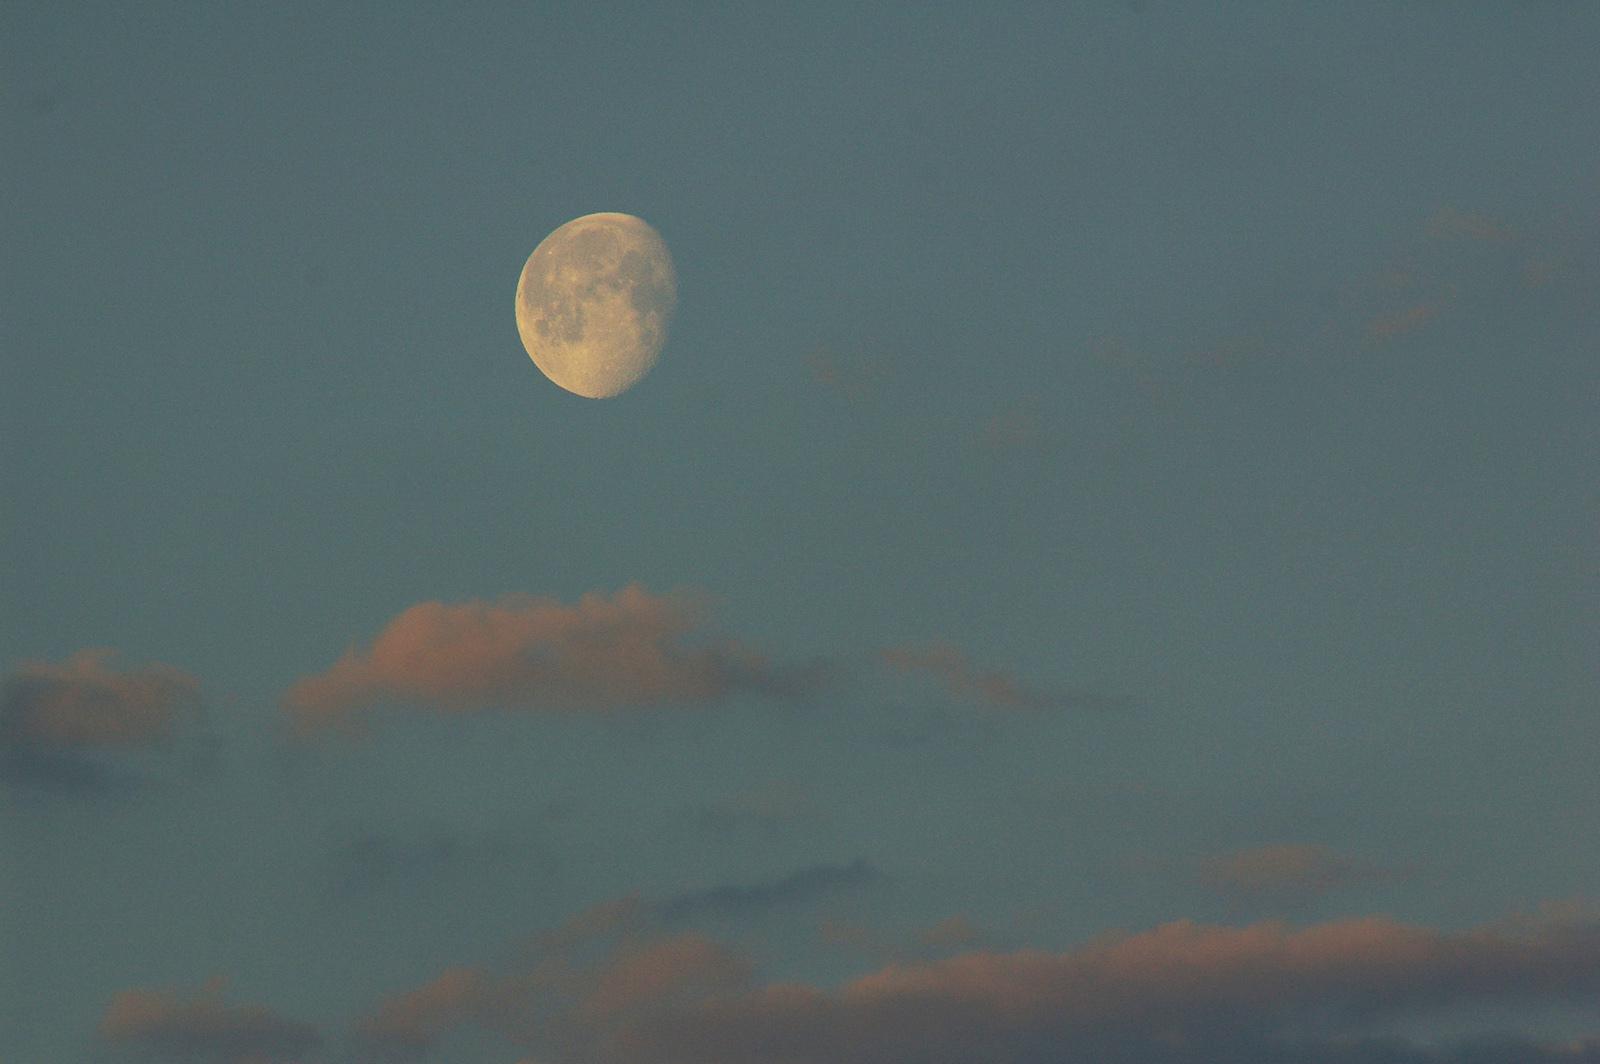 lune11avril2020-7h20-red.jpg